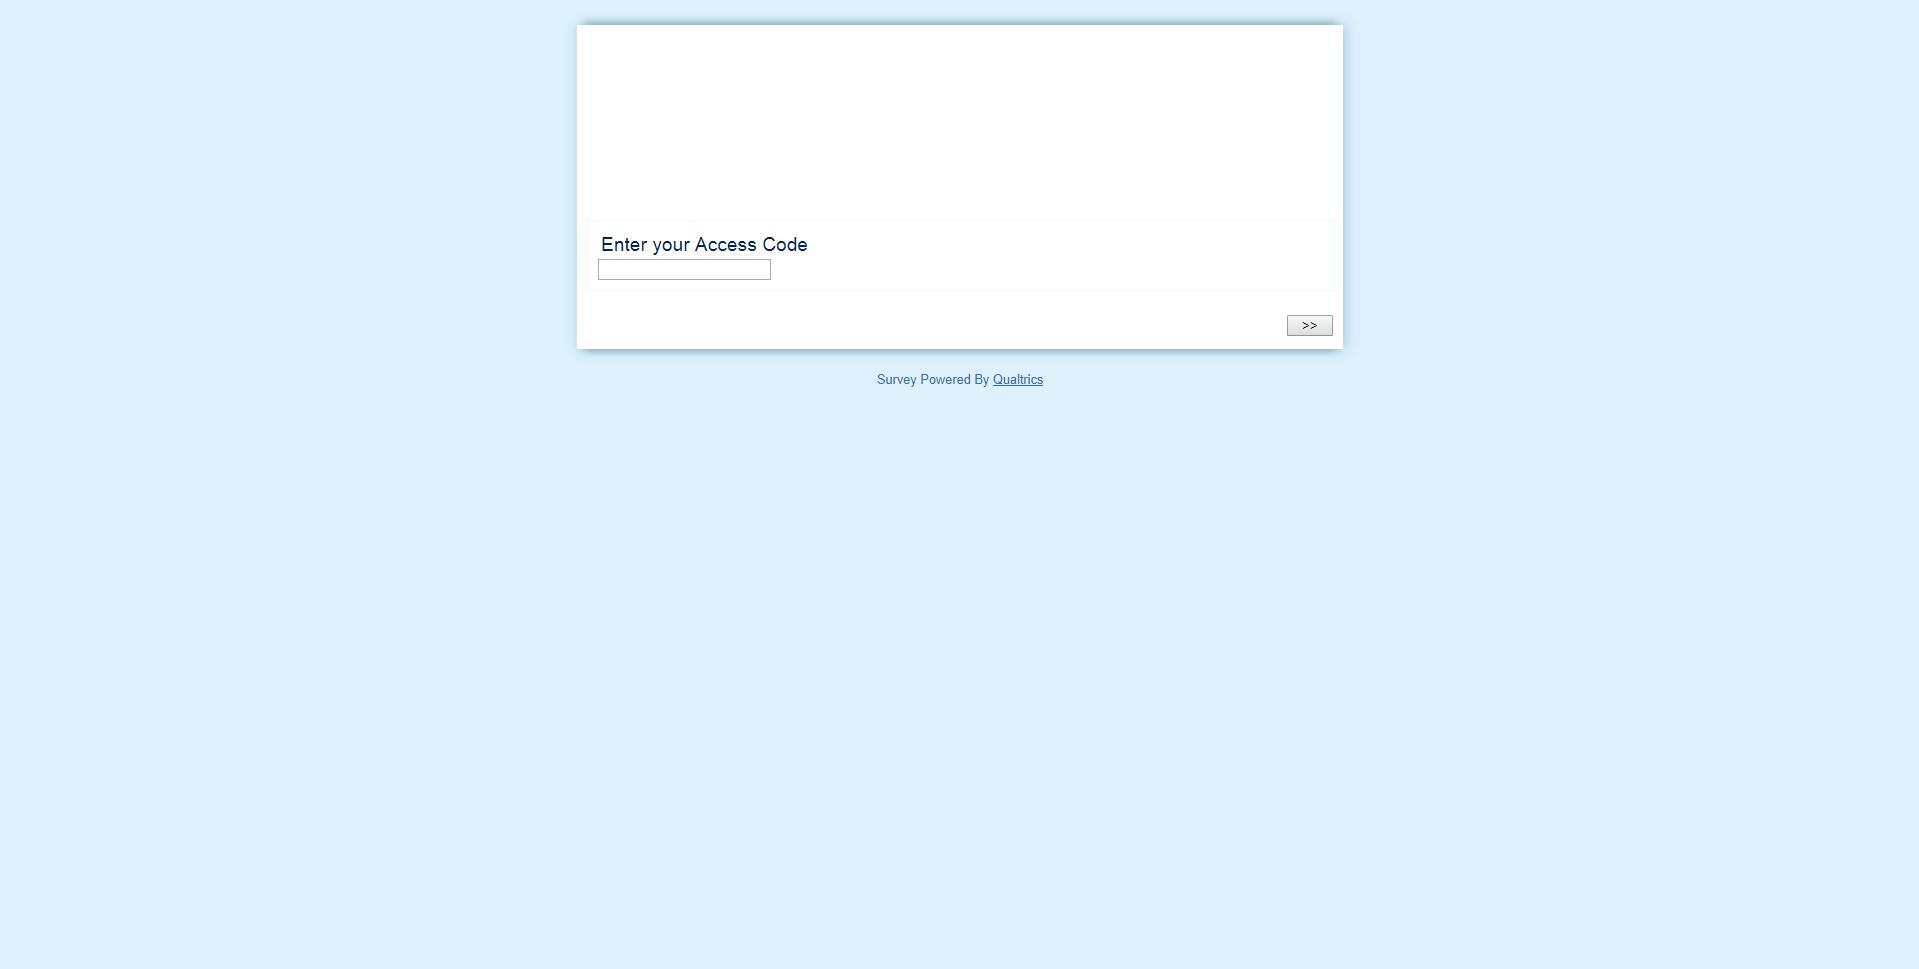 www.marriottvacationclub.com/survey